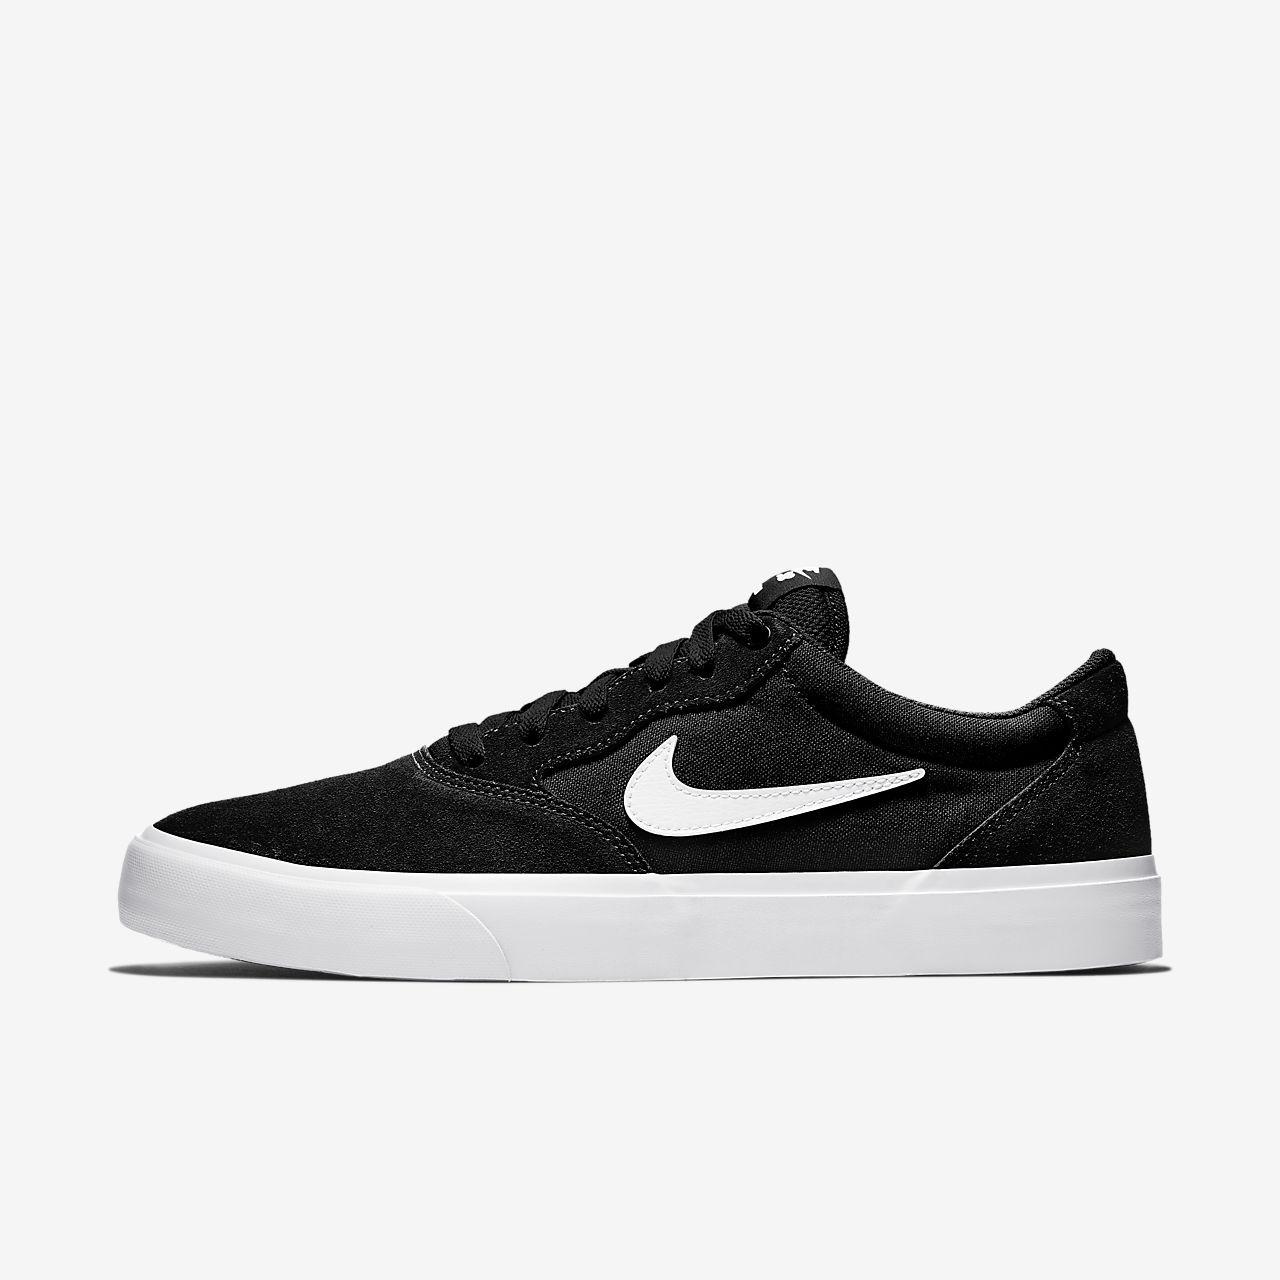 nike sb charge slr skate shoes - black/white